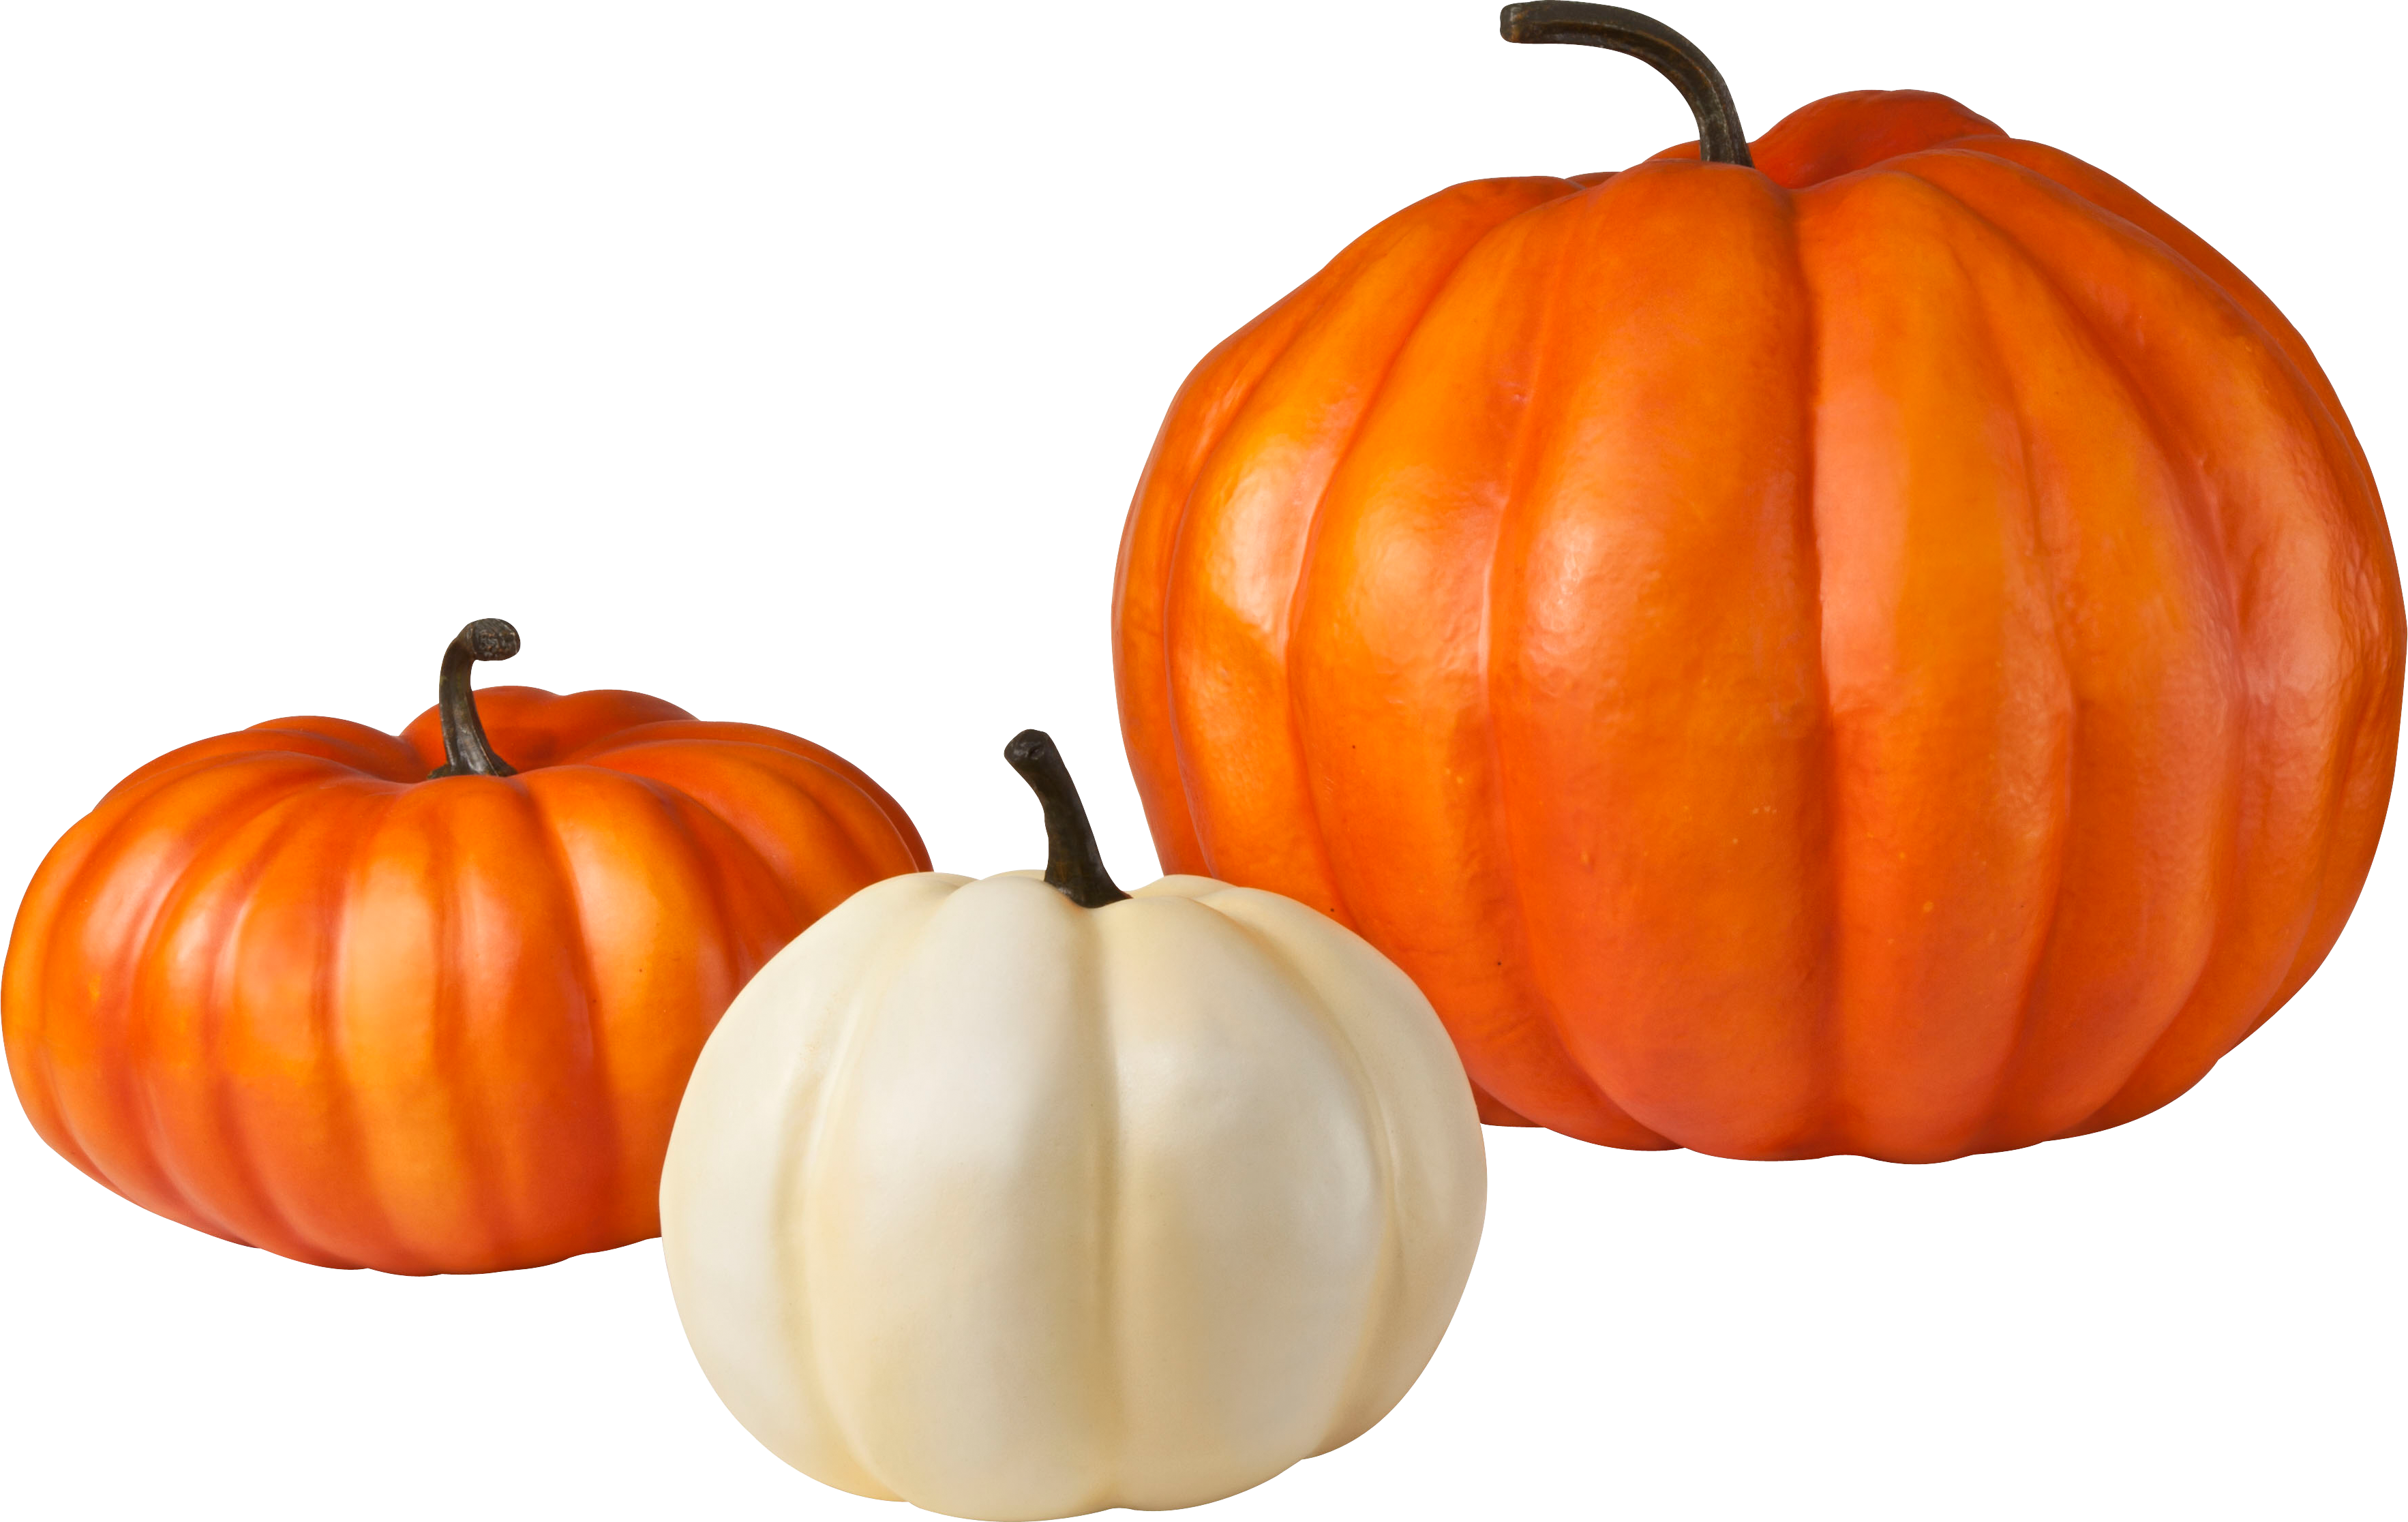 Png images free download. Clipart pumpkin transparent background